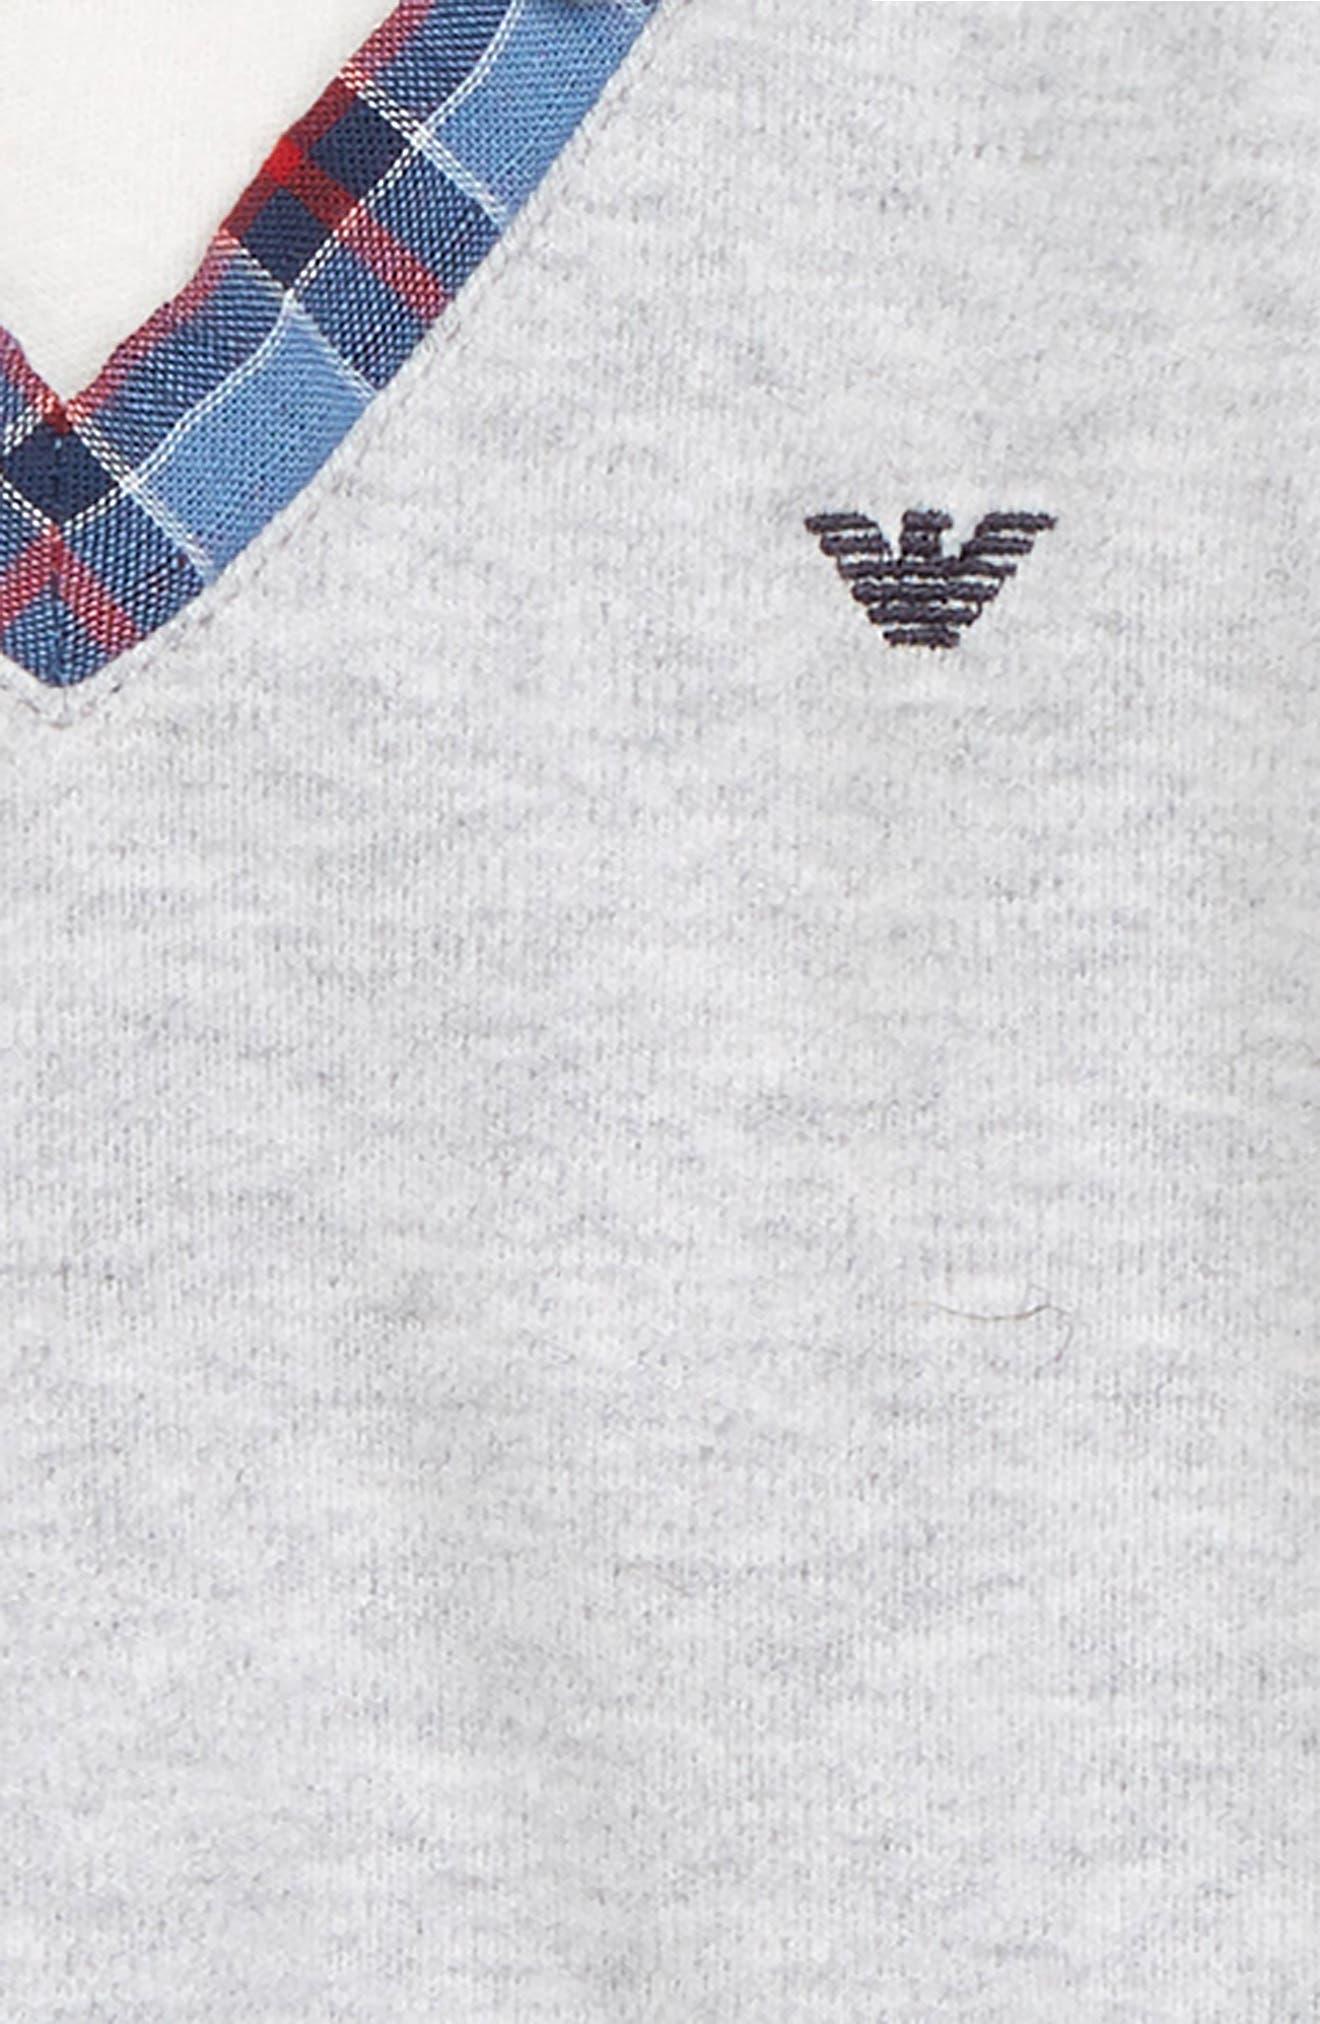 Polo Vest Romper,                             Alternate thumbnail 3, color,                             SOLID BLUE NAVY